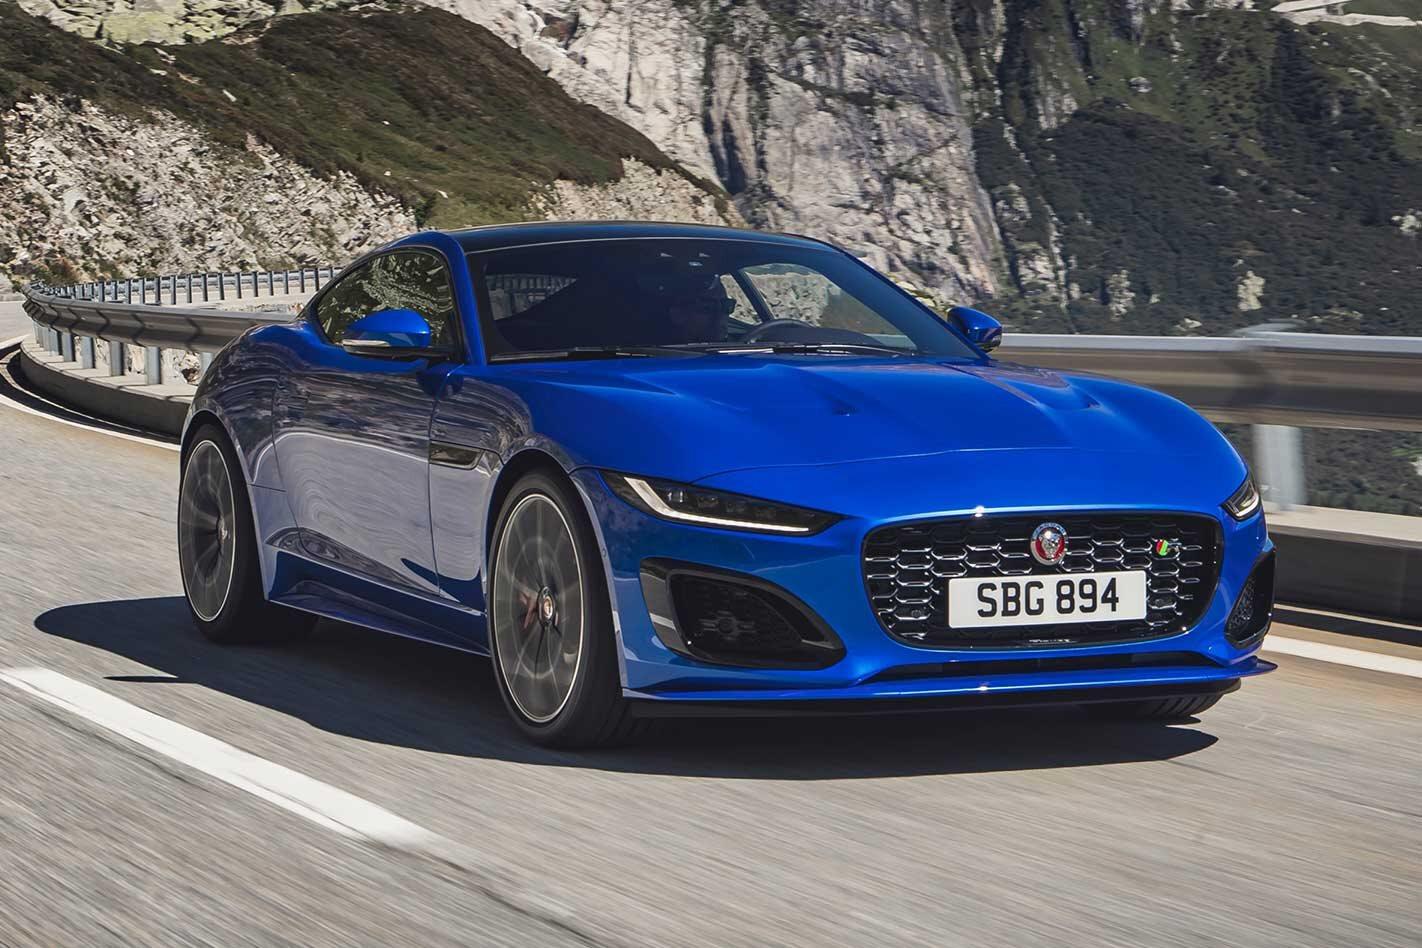 2020 Jaguar F-Type revealed